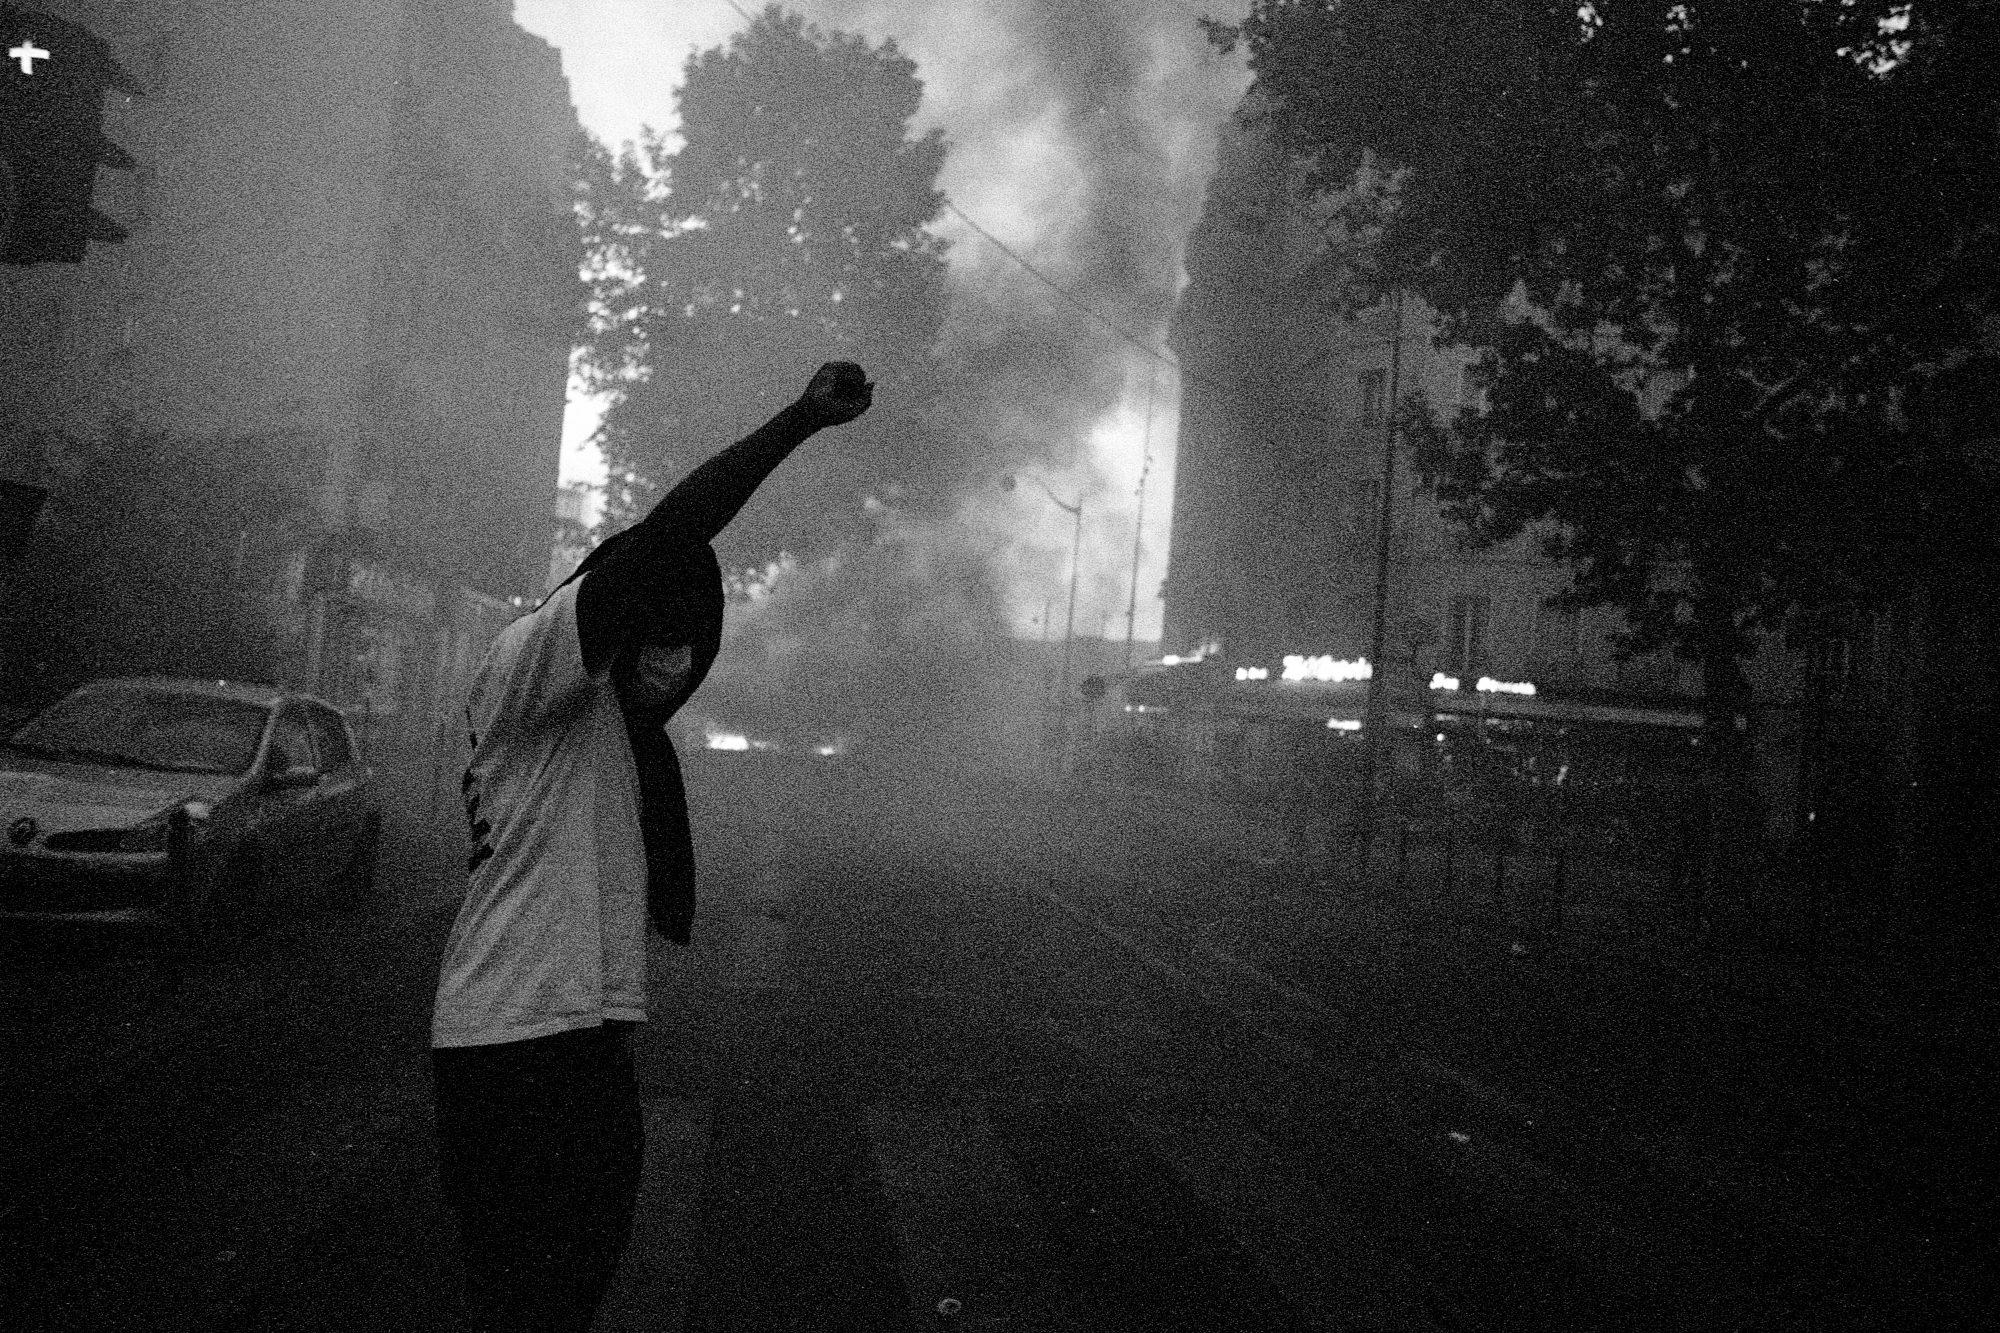 Protester giving salute (Pic: Geoffrey Belhadj)